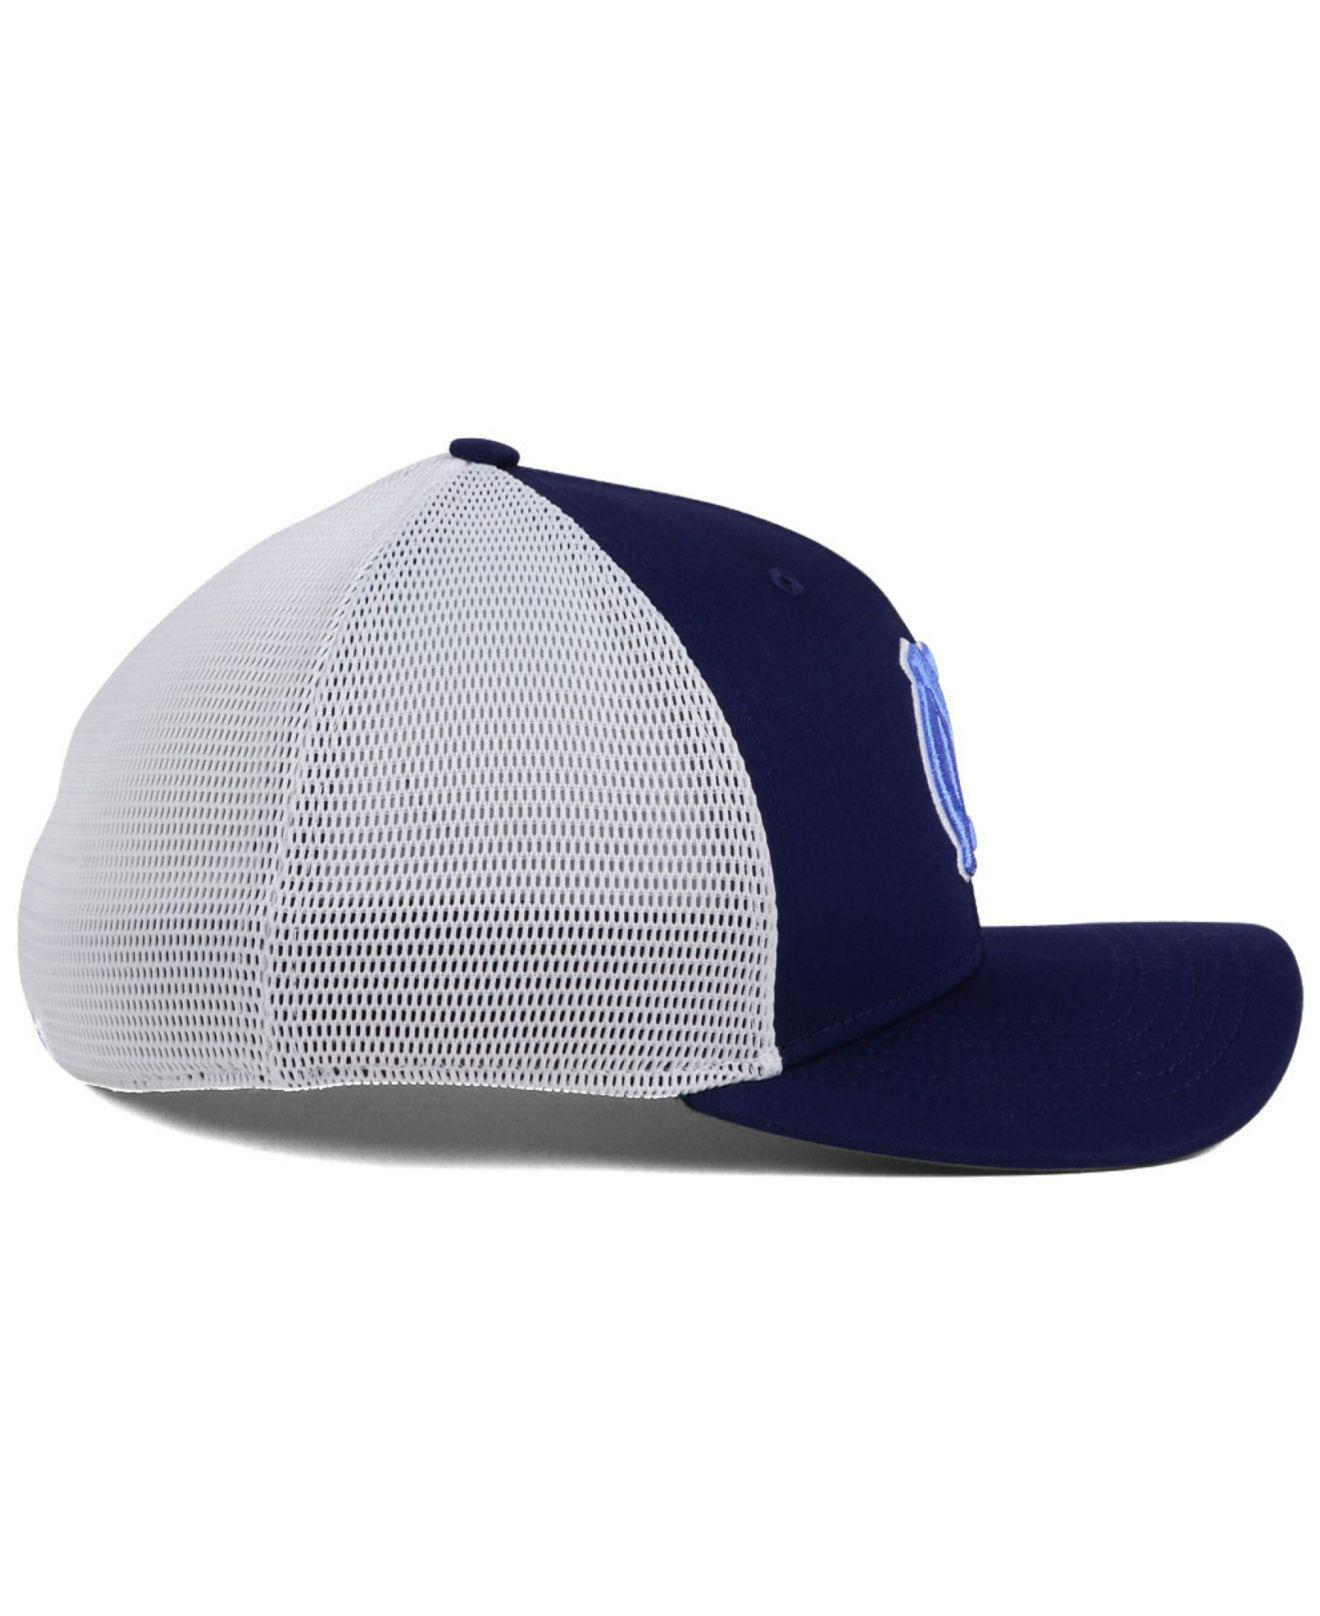 buy popular 1ed18 7acd5 ... real nike blue ncaa aero bill mesh swooshflex cap for men lyst. view  fullscreen 1b5e9